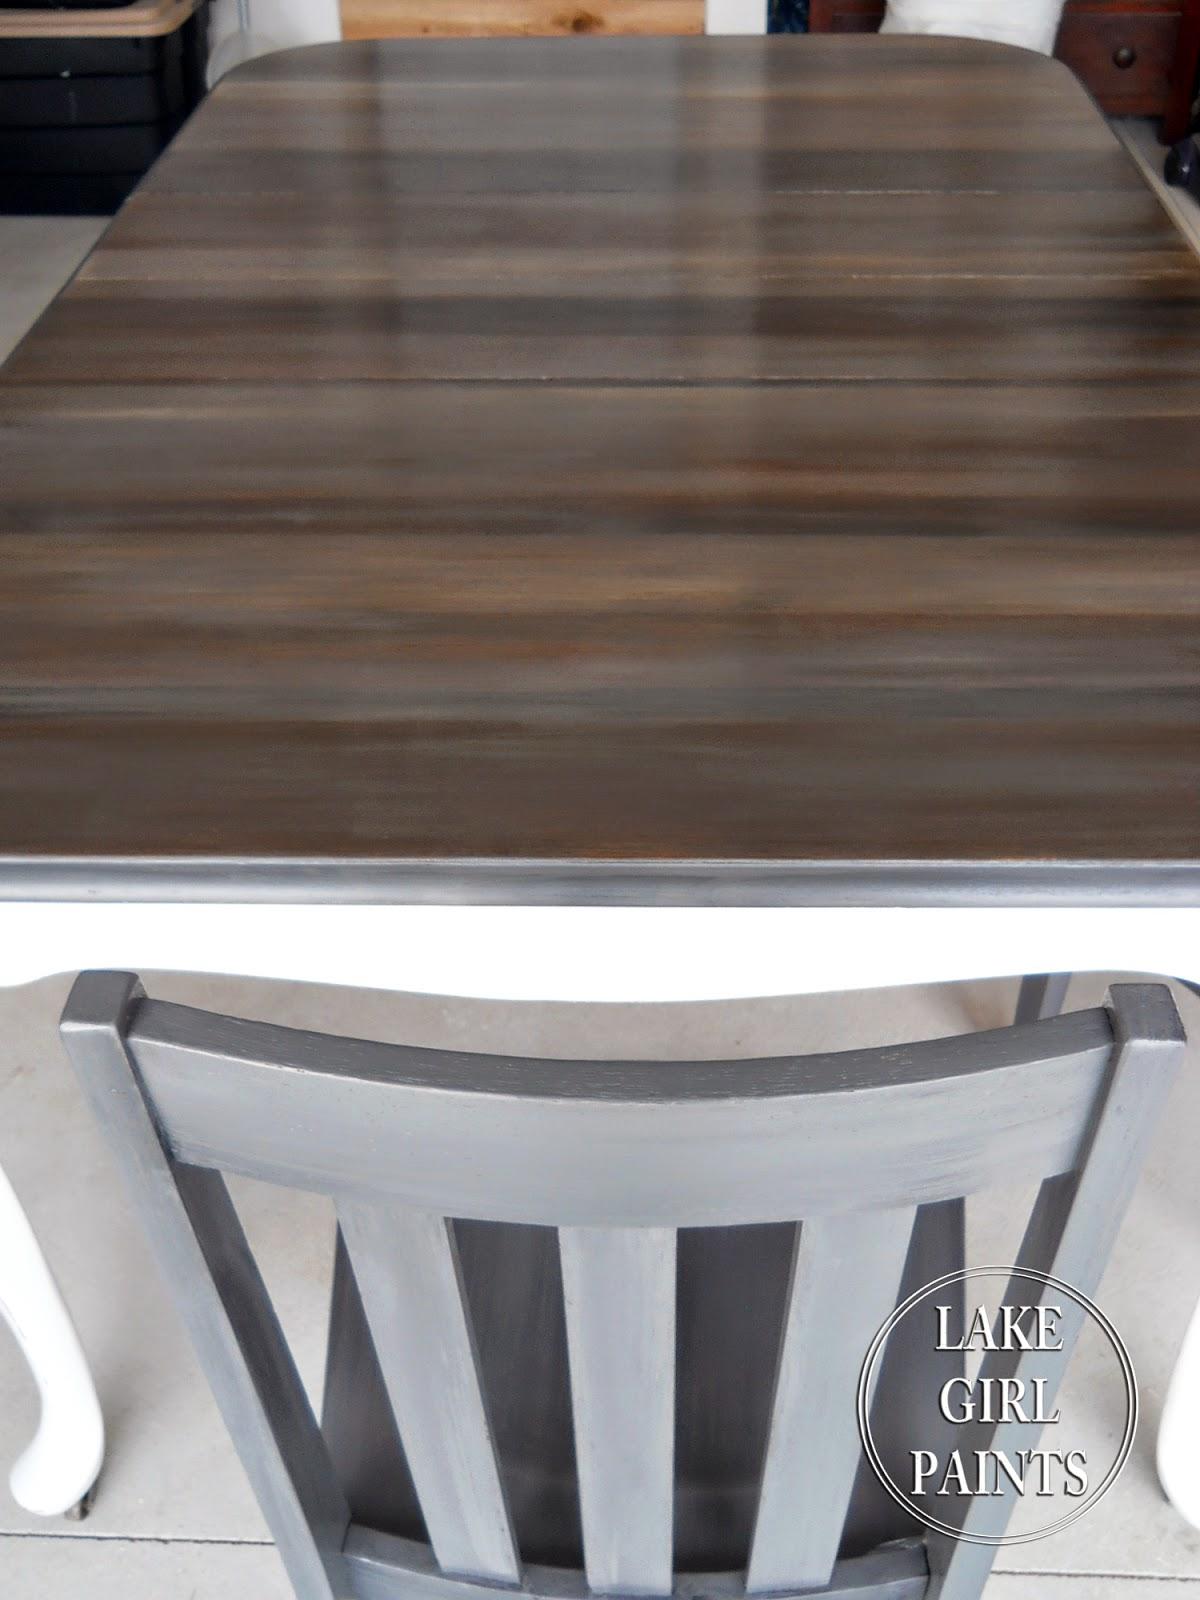 Lake Girl Paints Dining Table Peeks Of Wood Grain